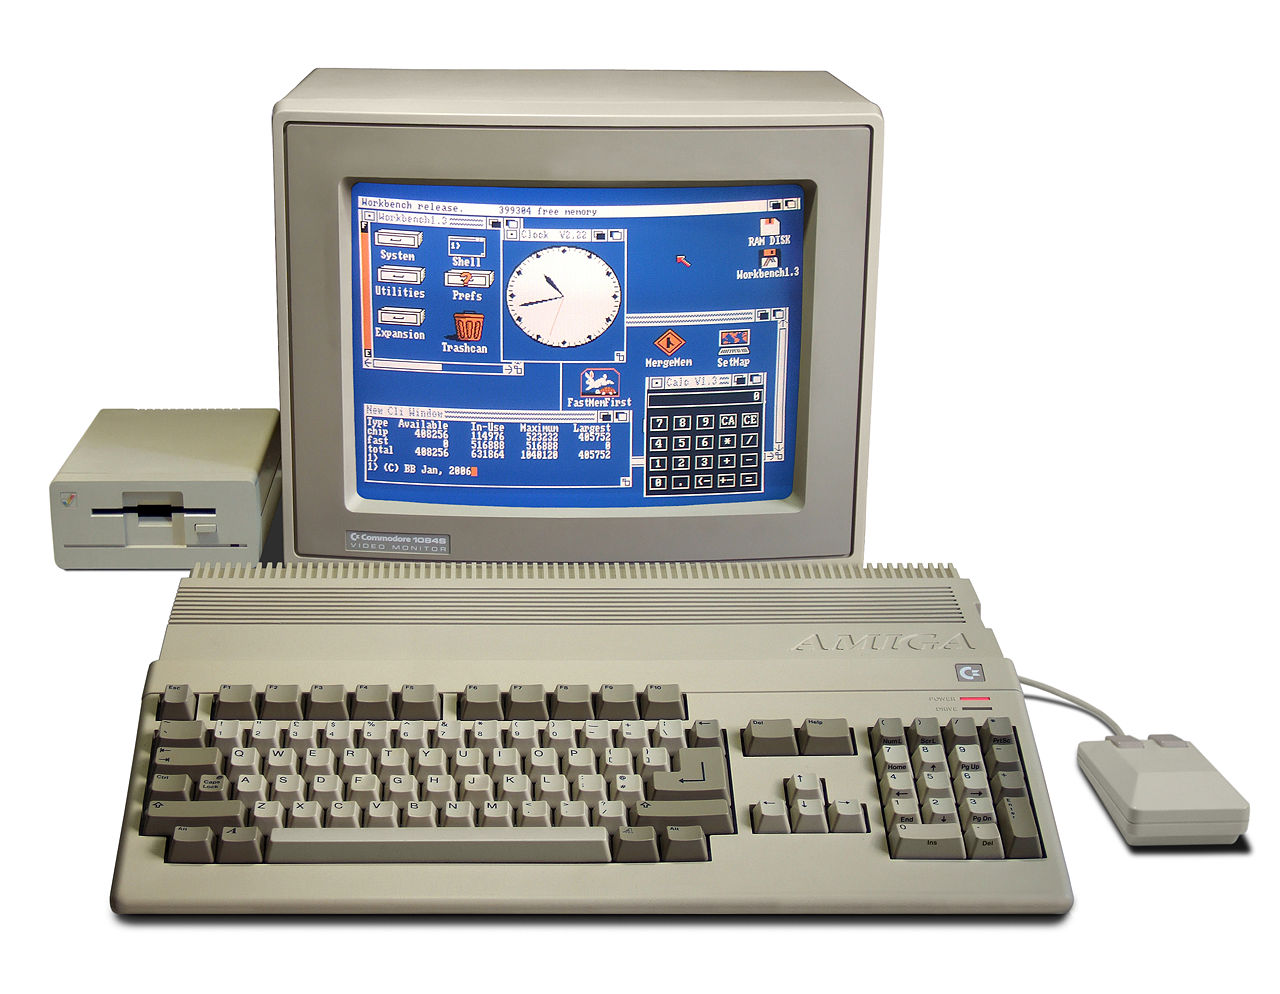 1280px Amiga500 System